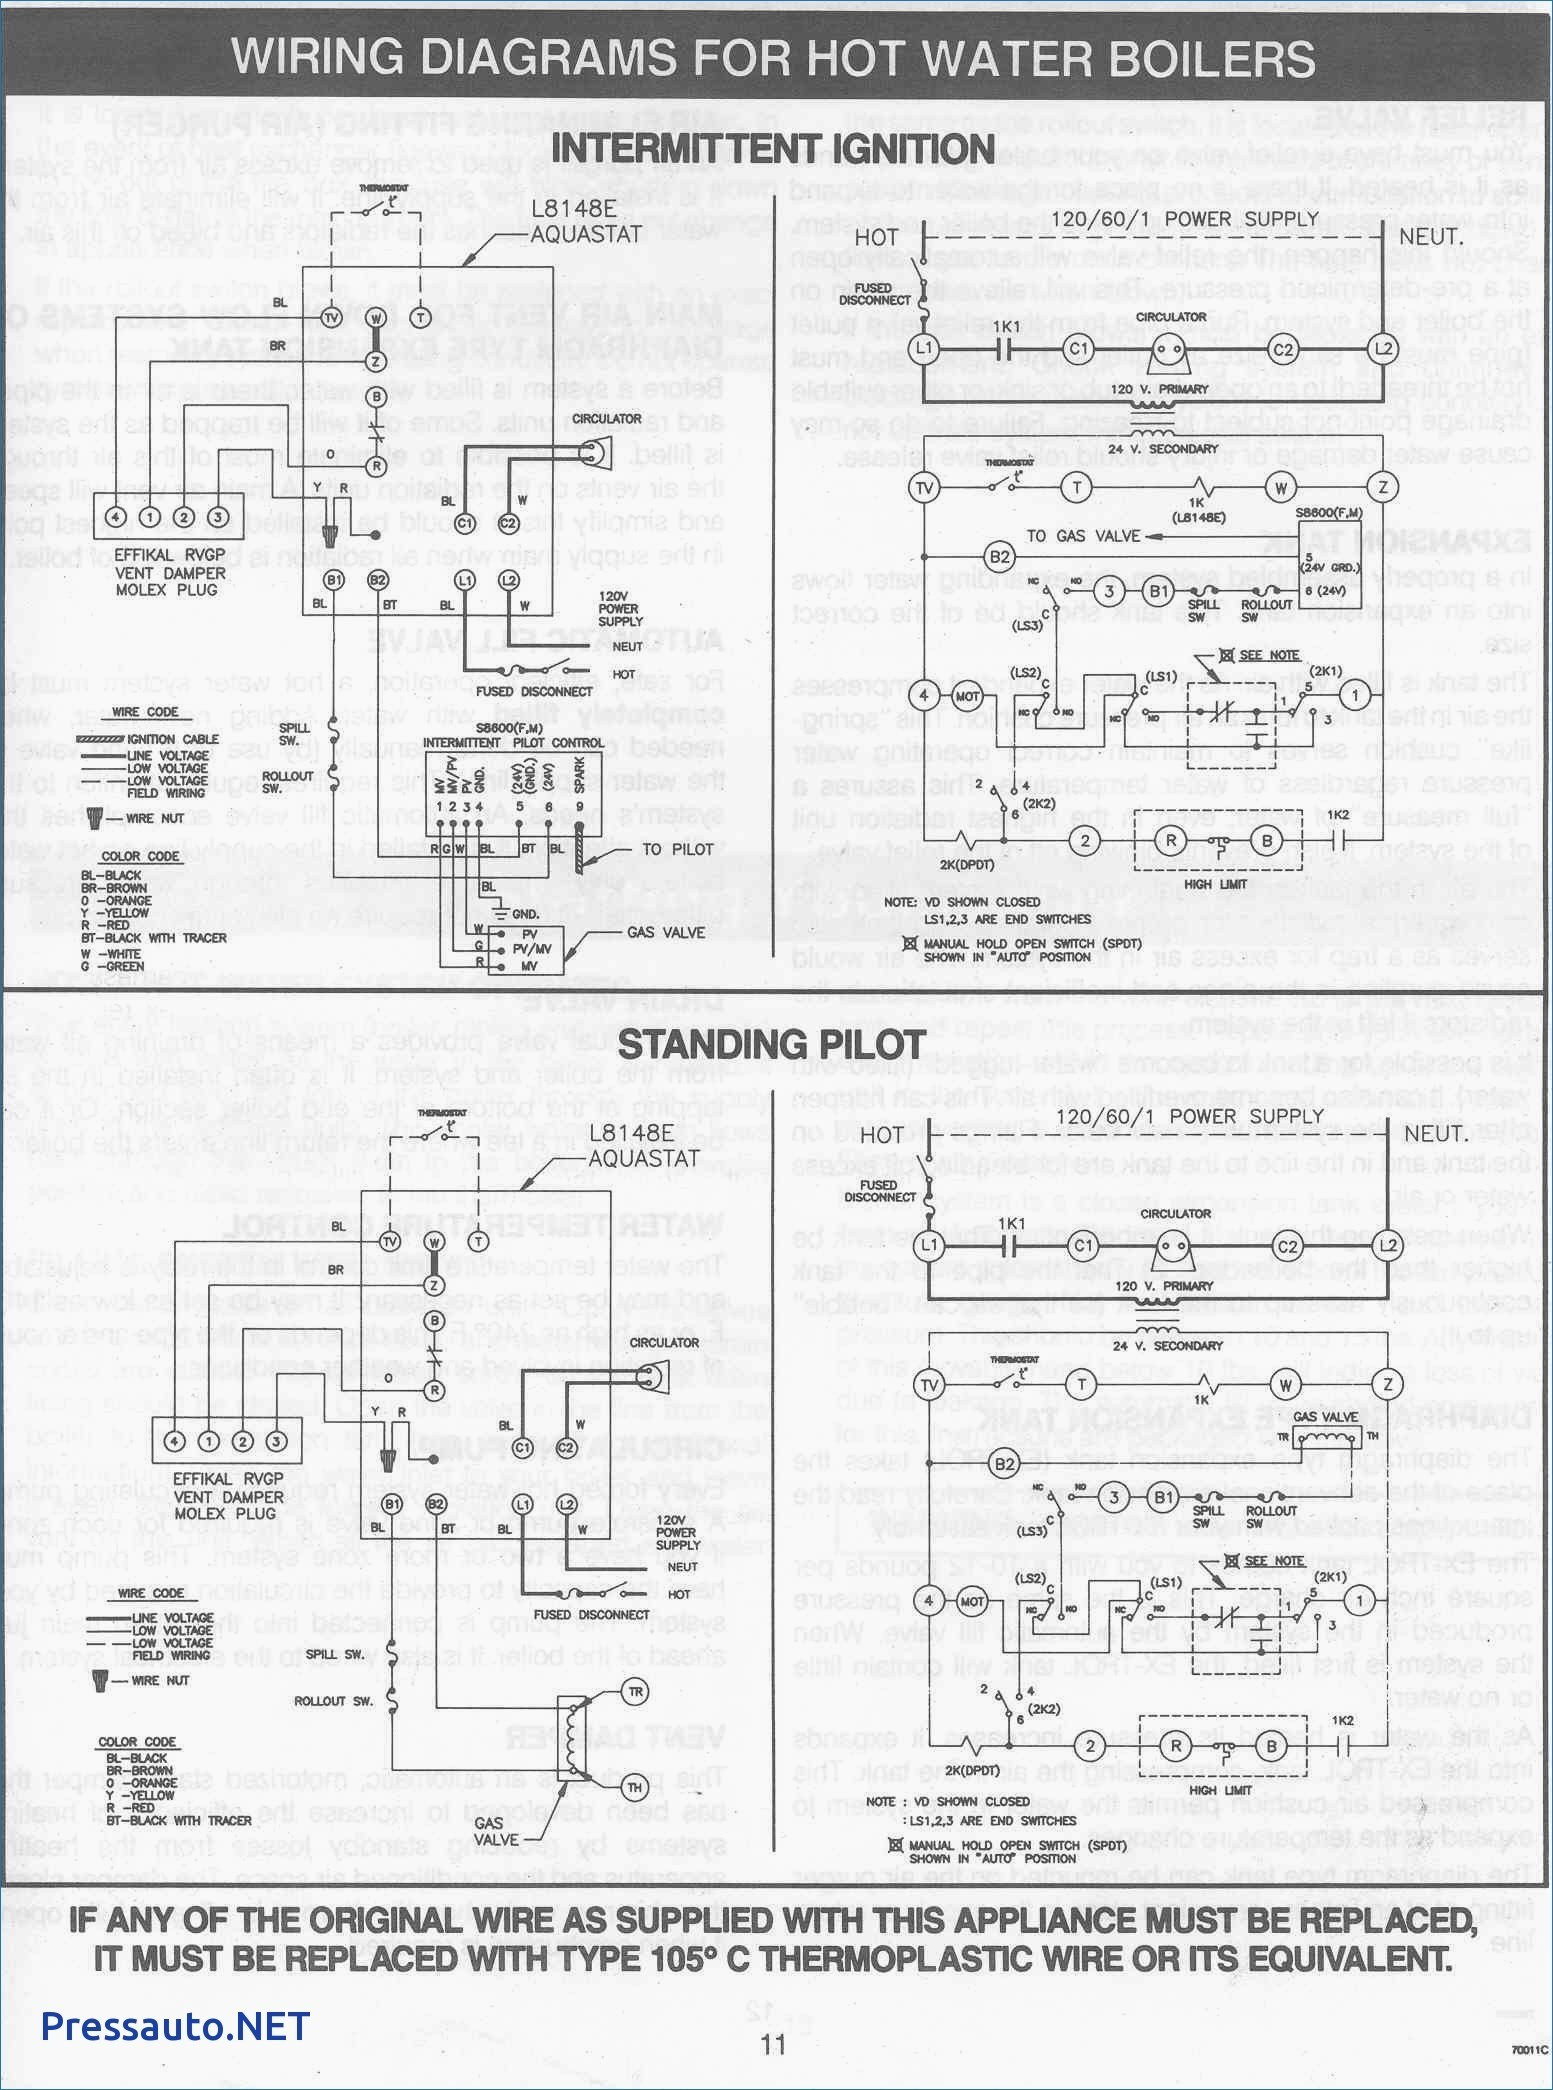 Honeywell L6006C Aquastat Wiring Diagram | Wiring Diagram - Honeywell Aquastat L8148E Wiring Diagram